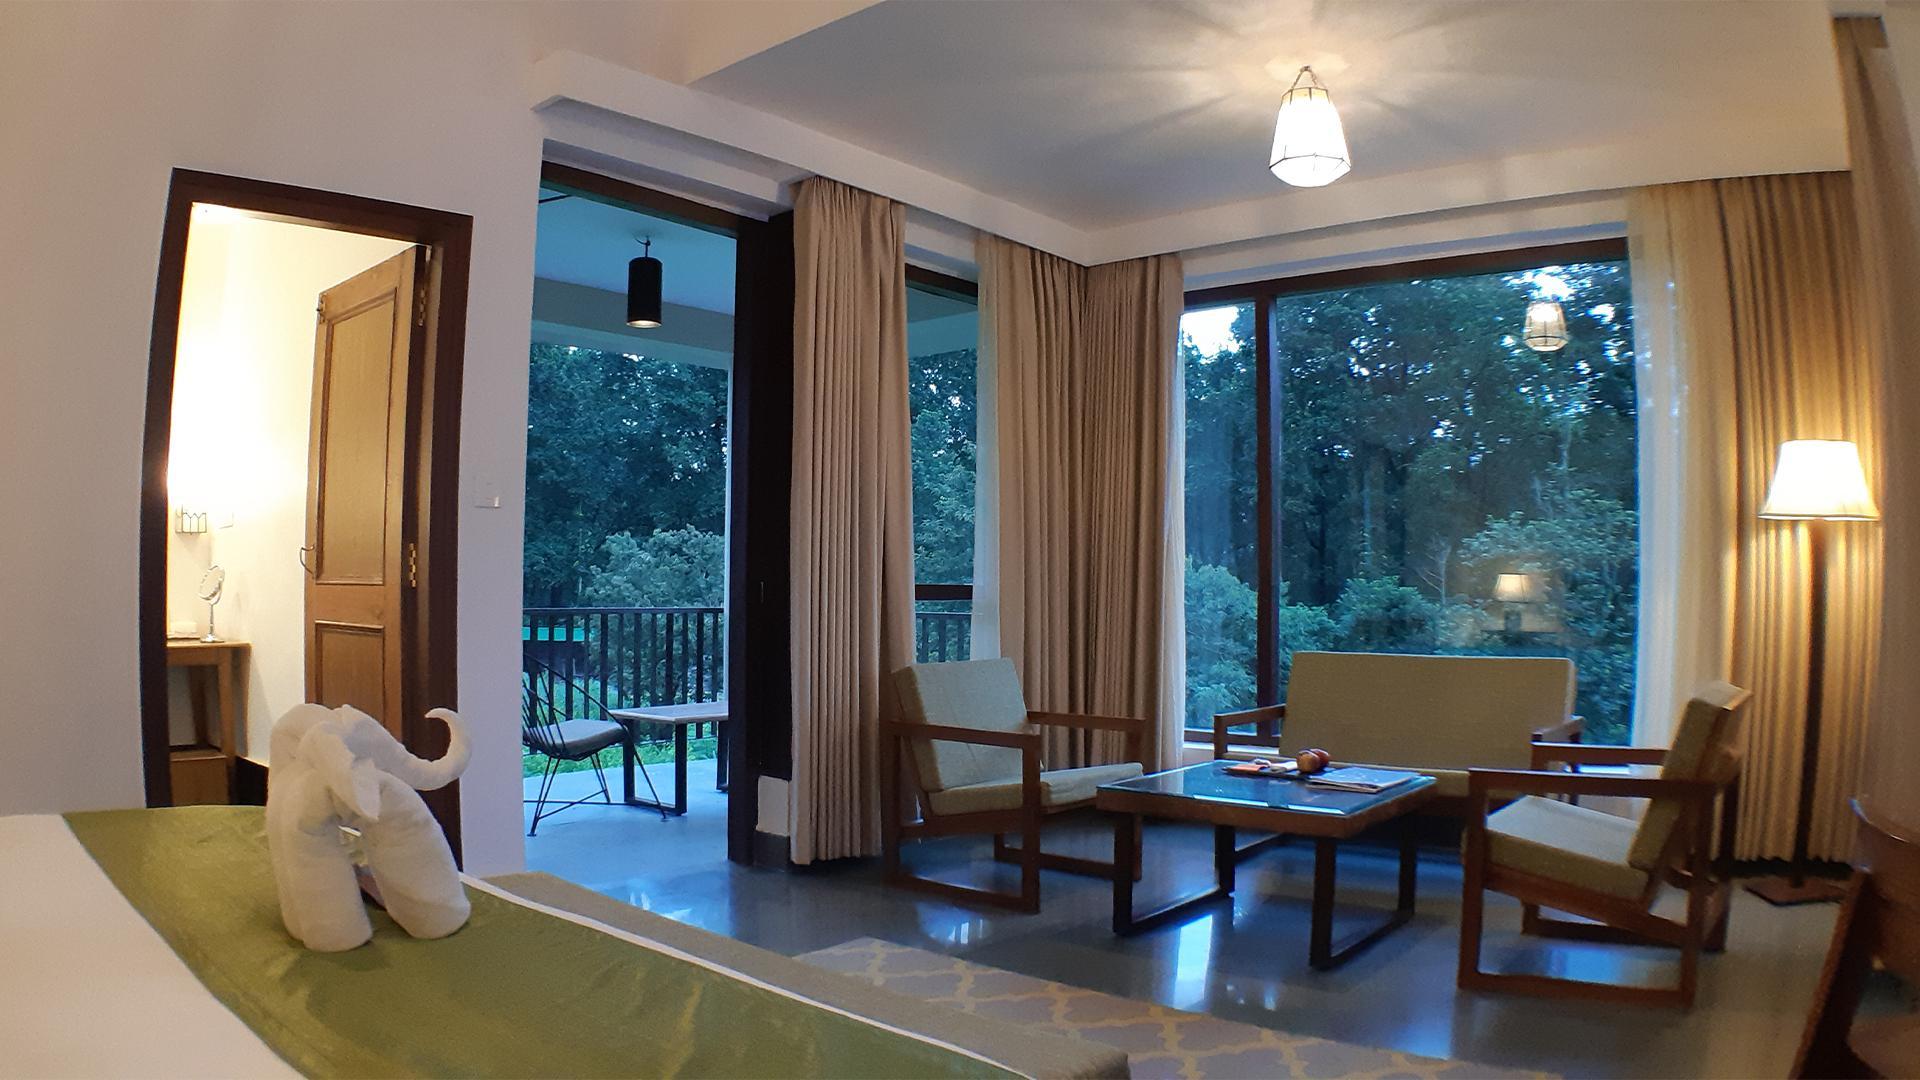 Standard Villa image 1 at Lebua Corbett by Pauri Garhwal, Uttarakhand, India